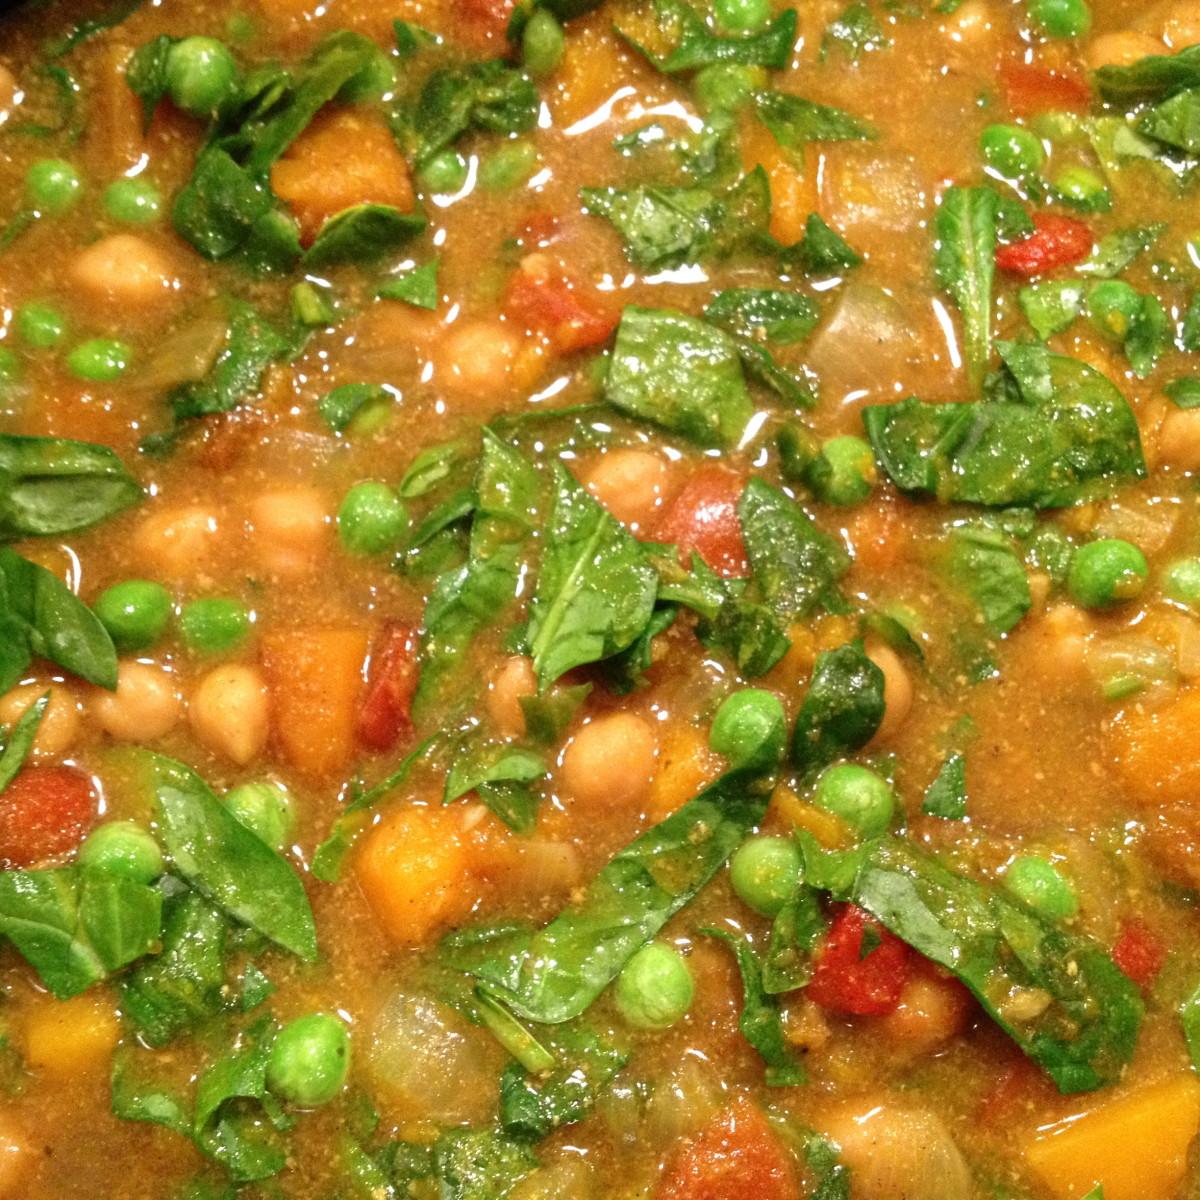 squash-chickpea-and-coconut-curry-recipe